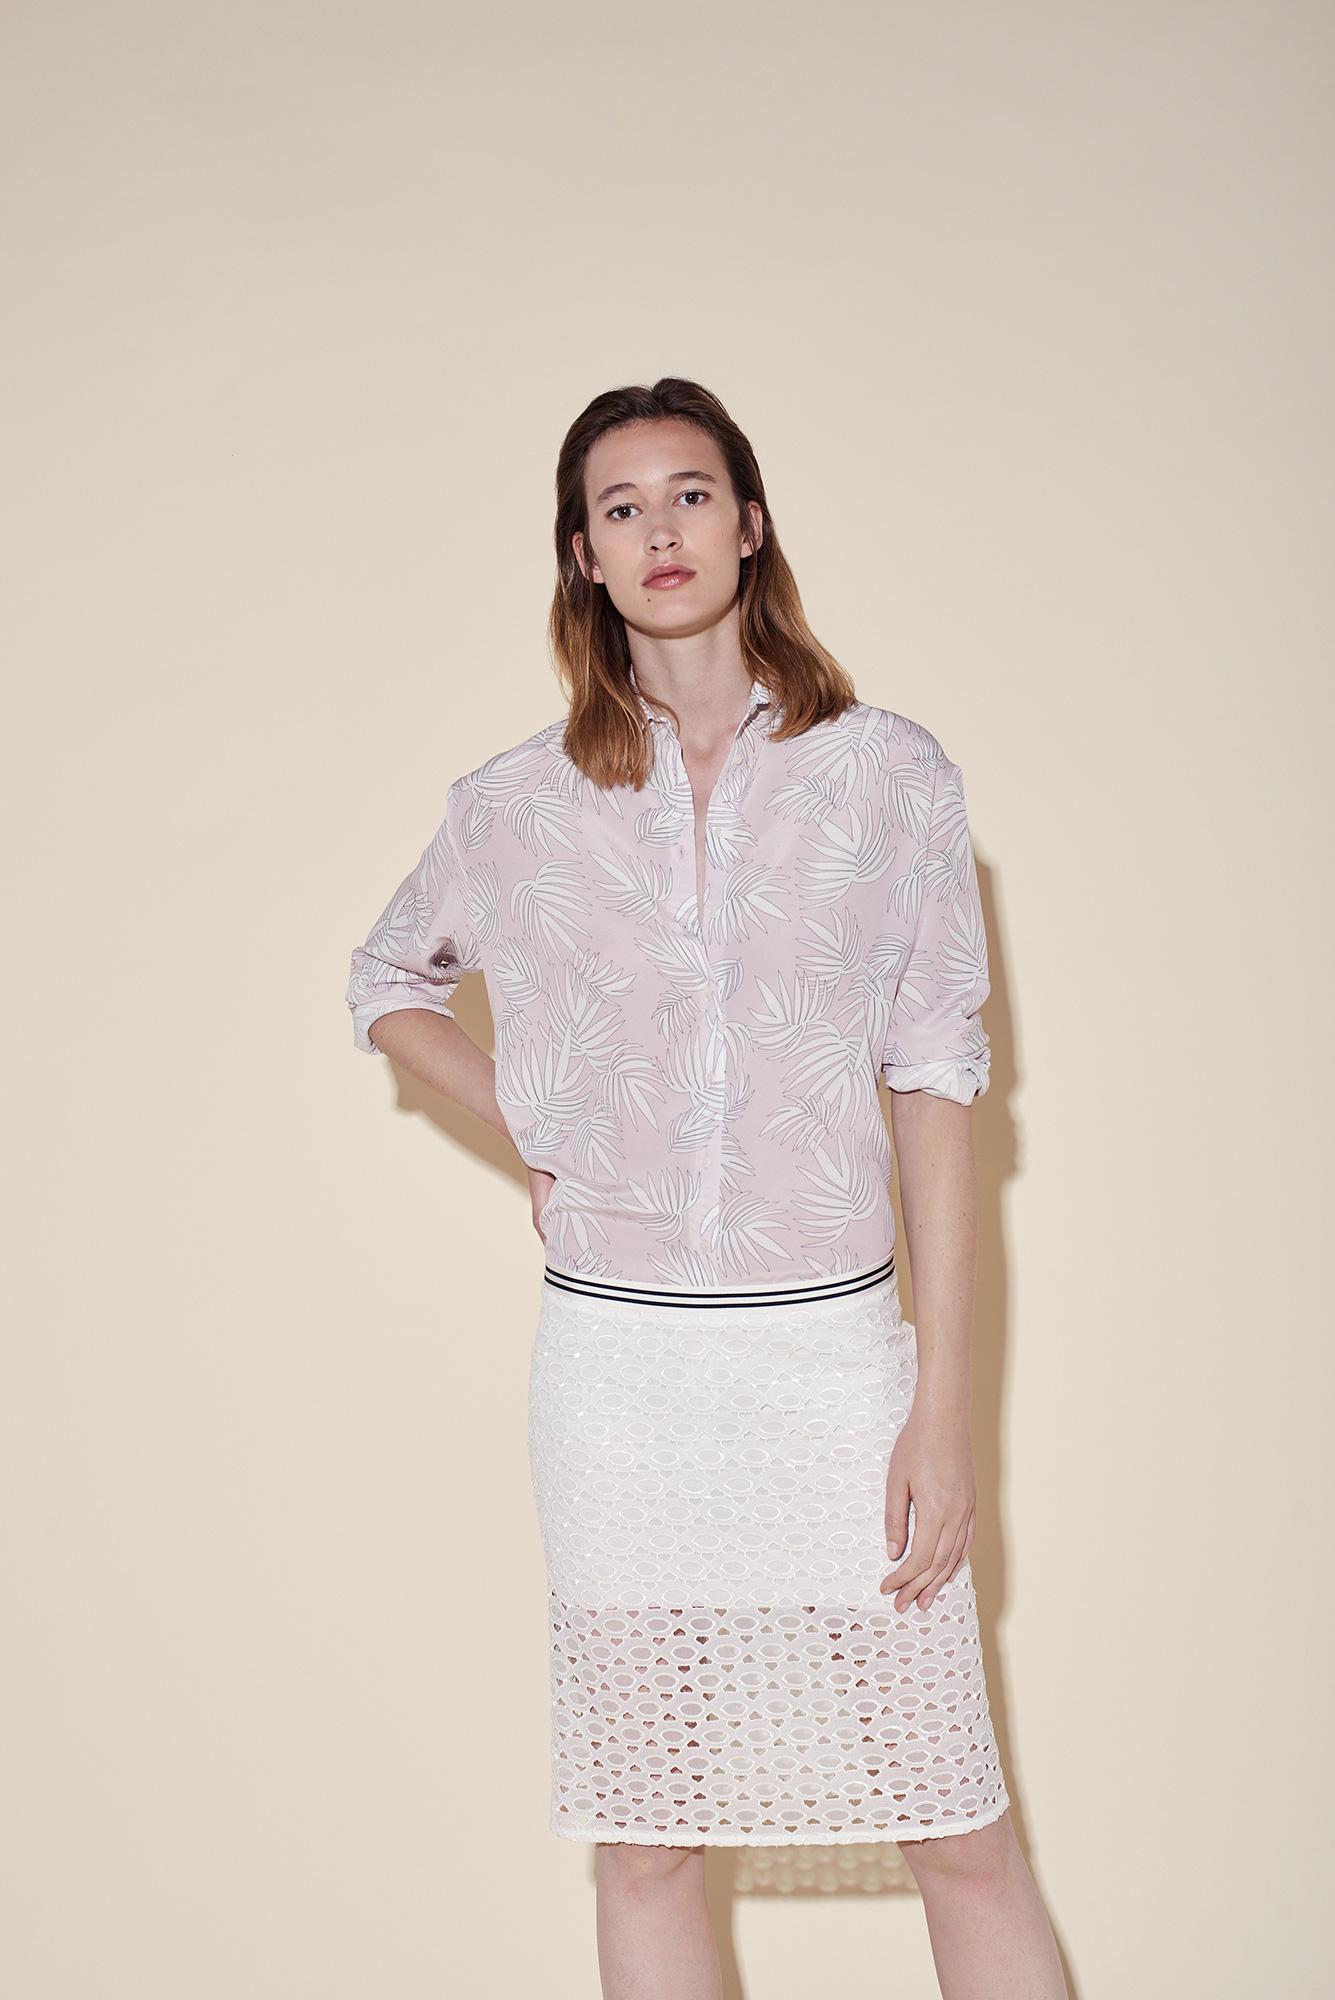 Man shirt silk crepe tropical pink – straight cut skirt silk broderie white